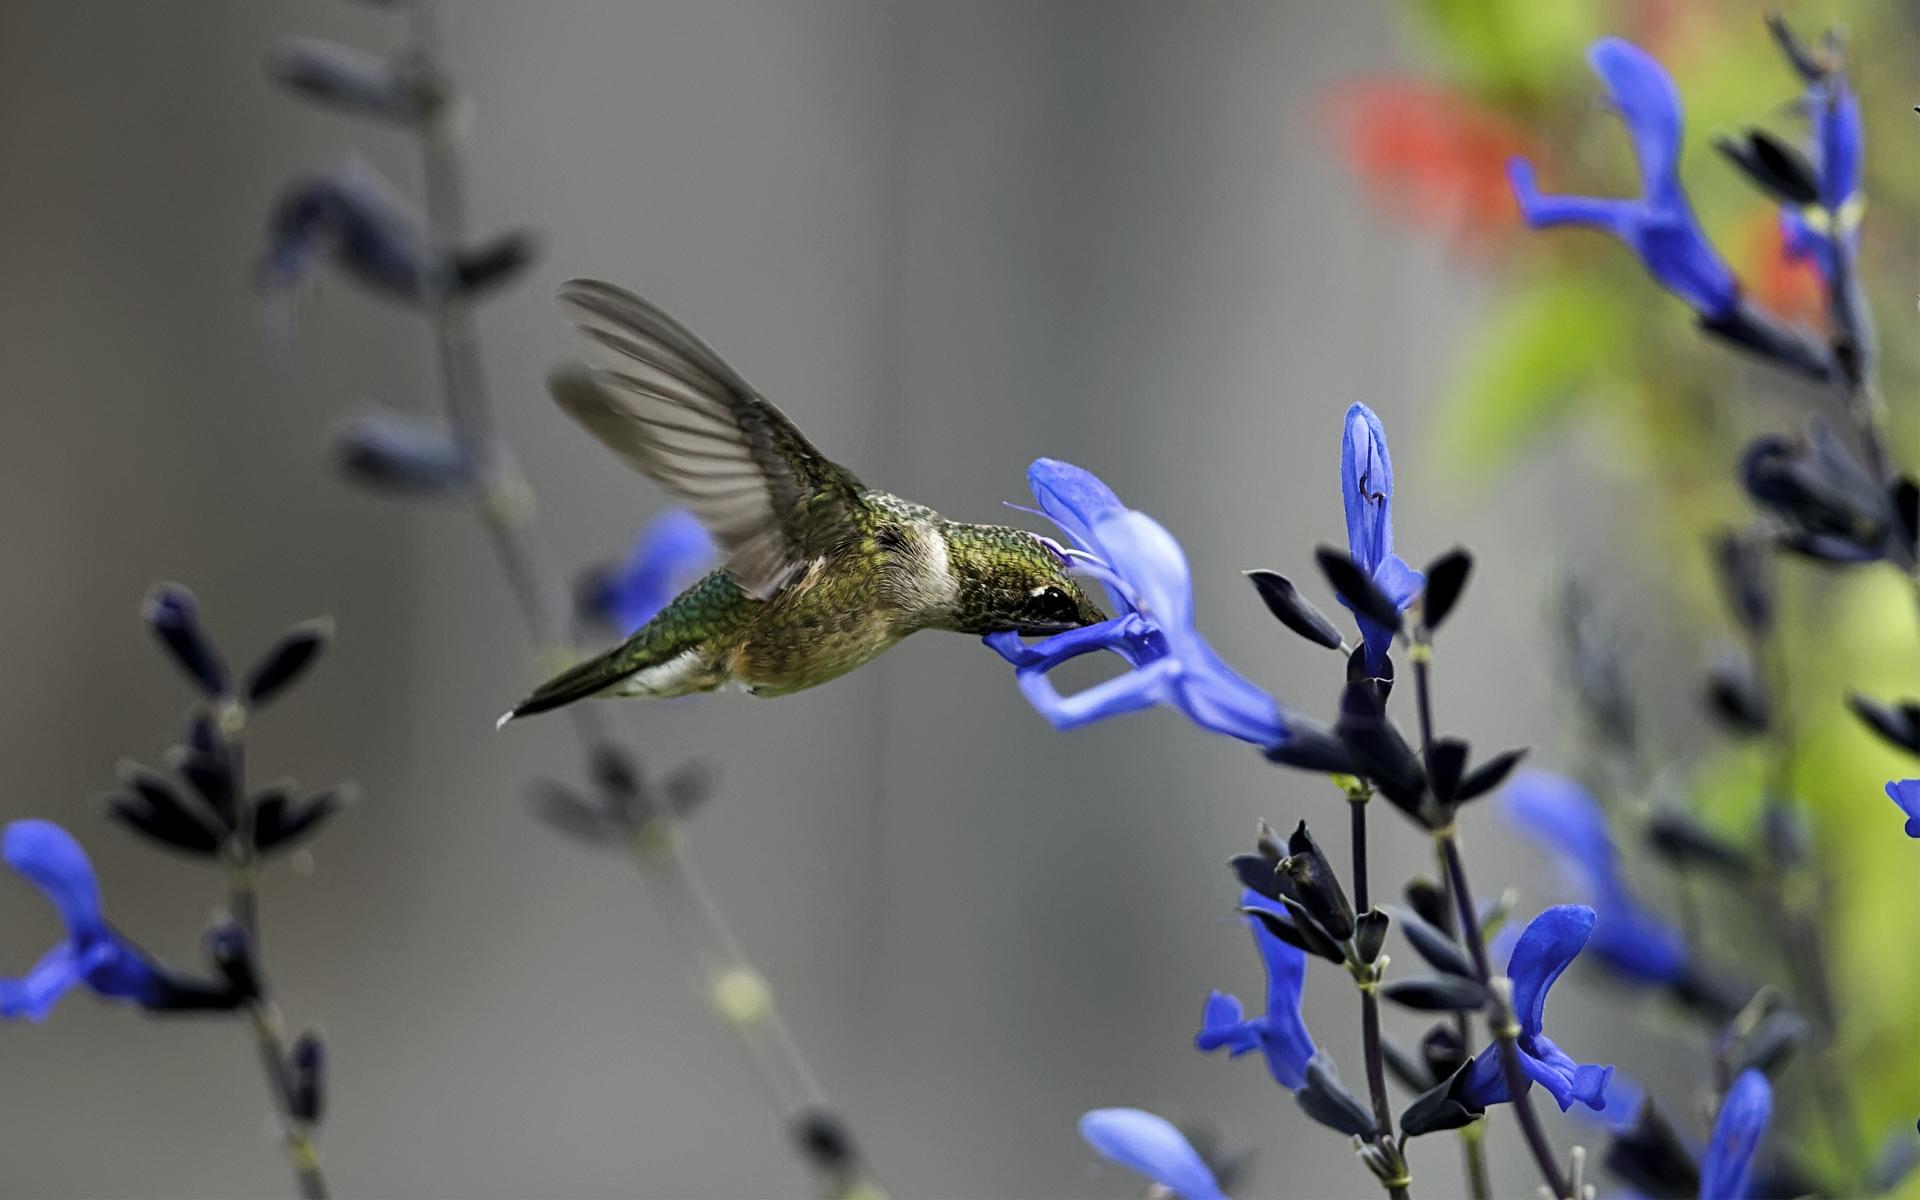 птица цветок  № 2034111 загрузить